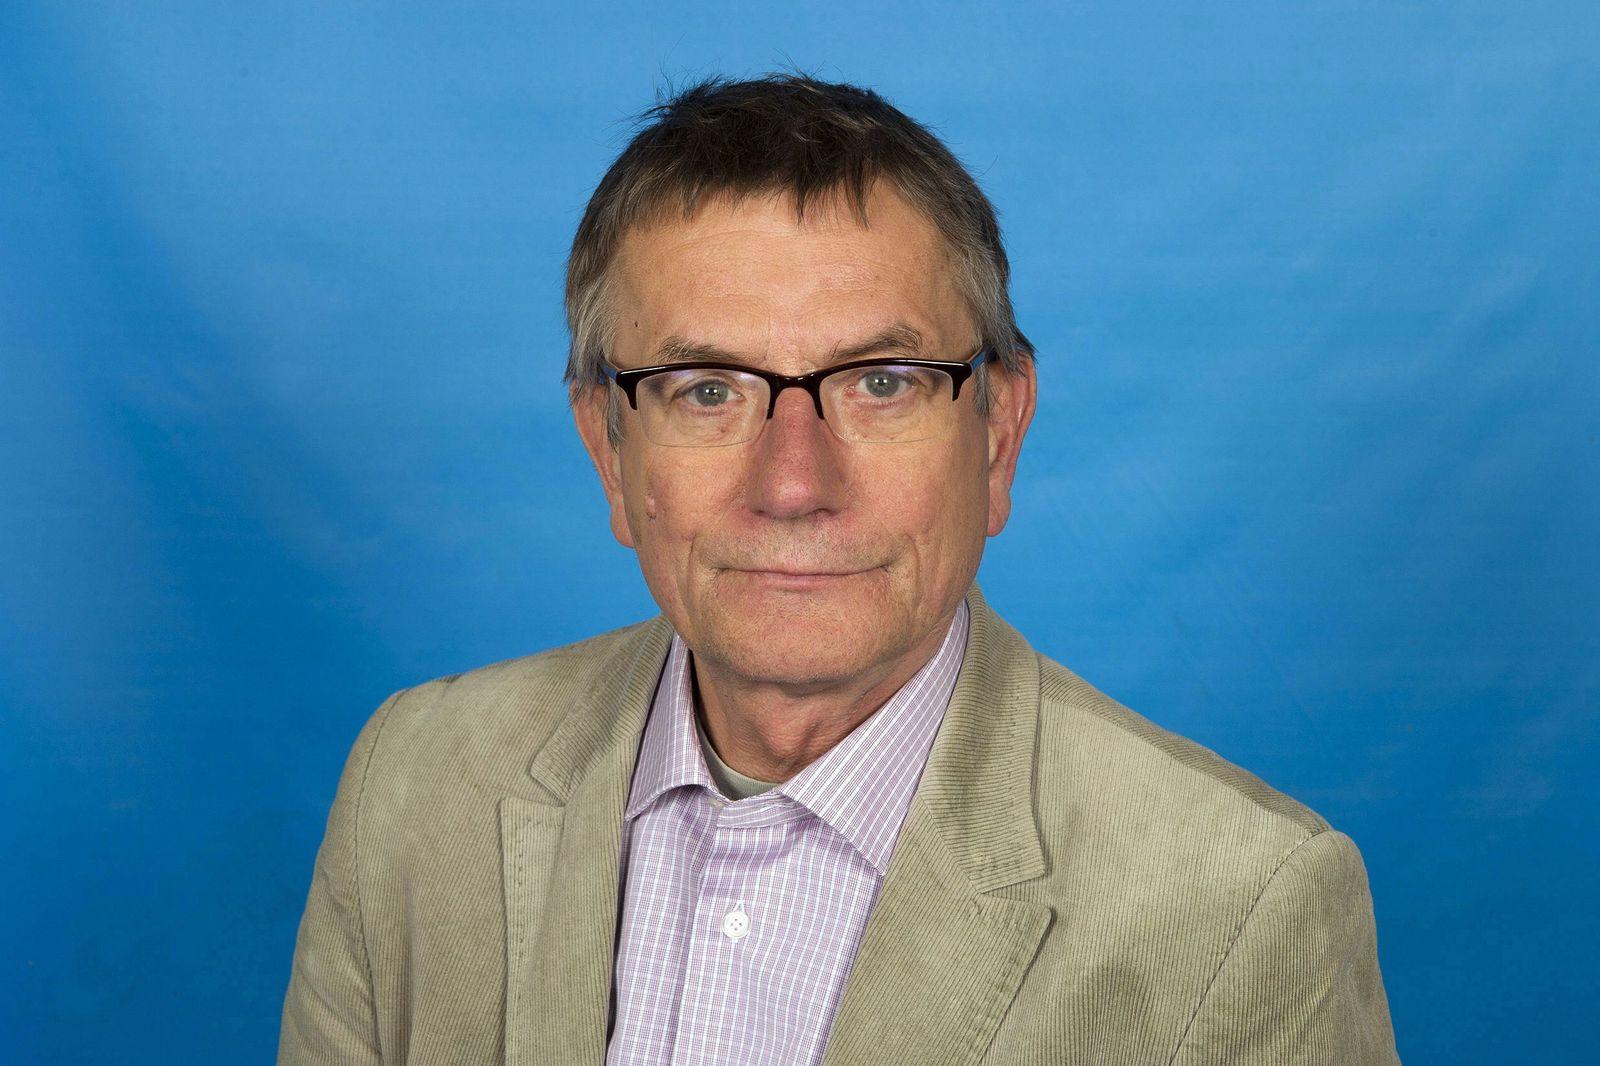 Jörg Armbruster